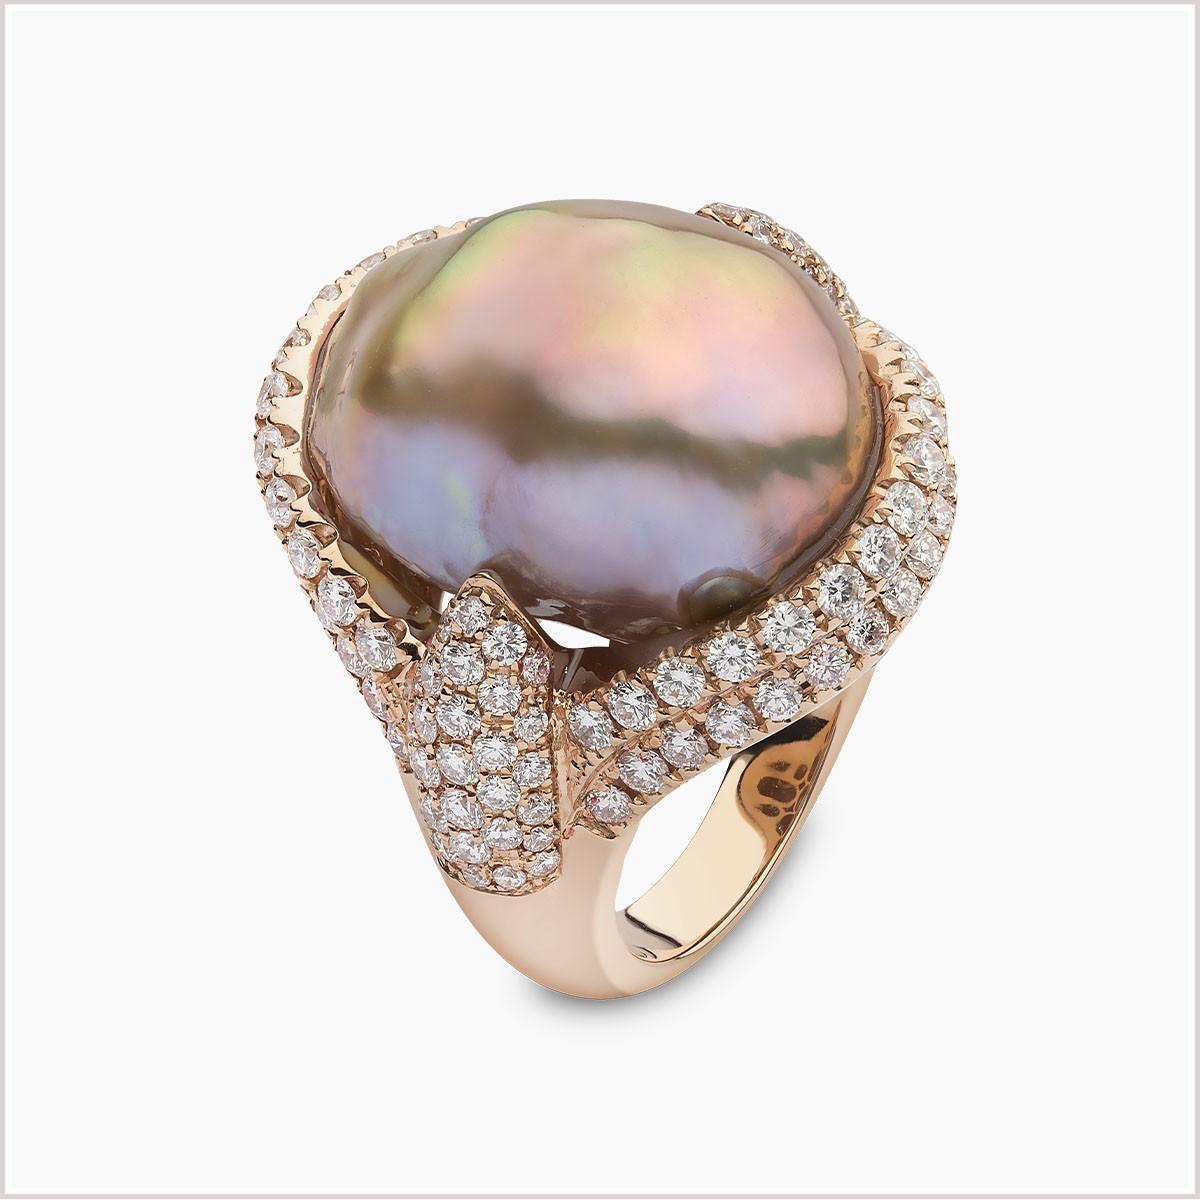 Yoko London Baroque Diamond and Freshwater Pearl Ring